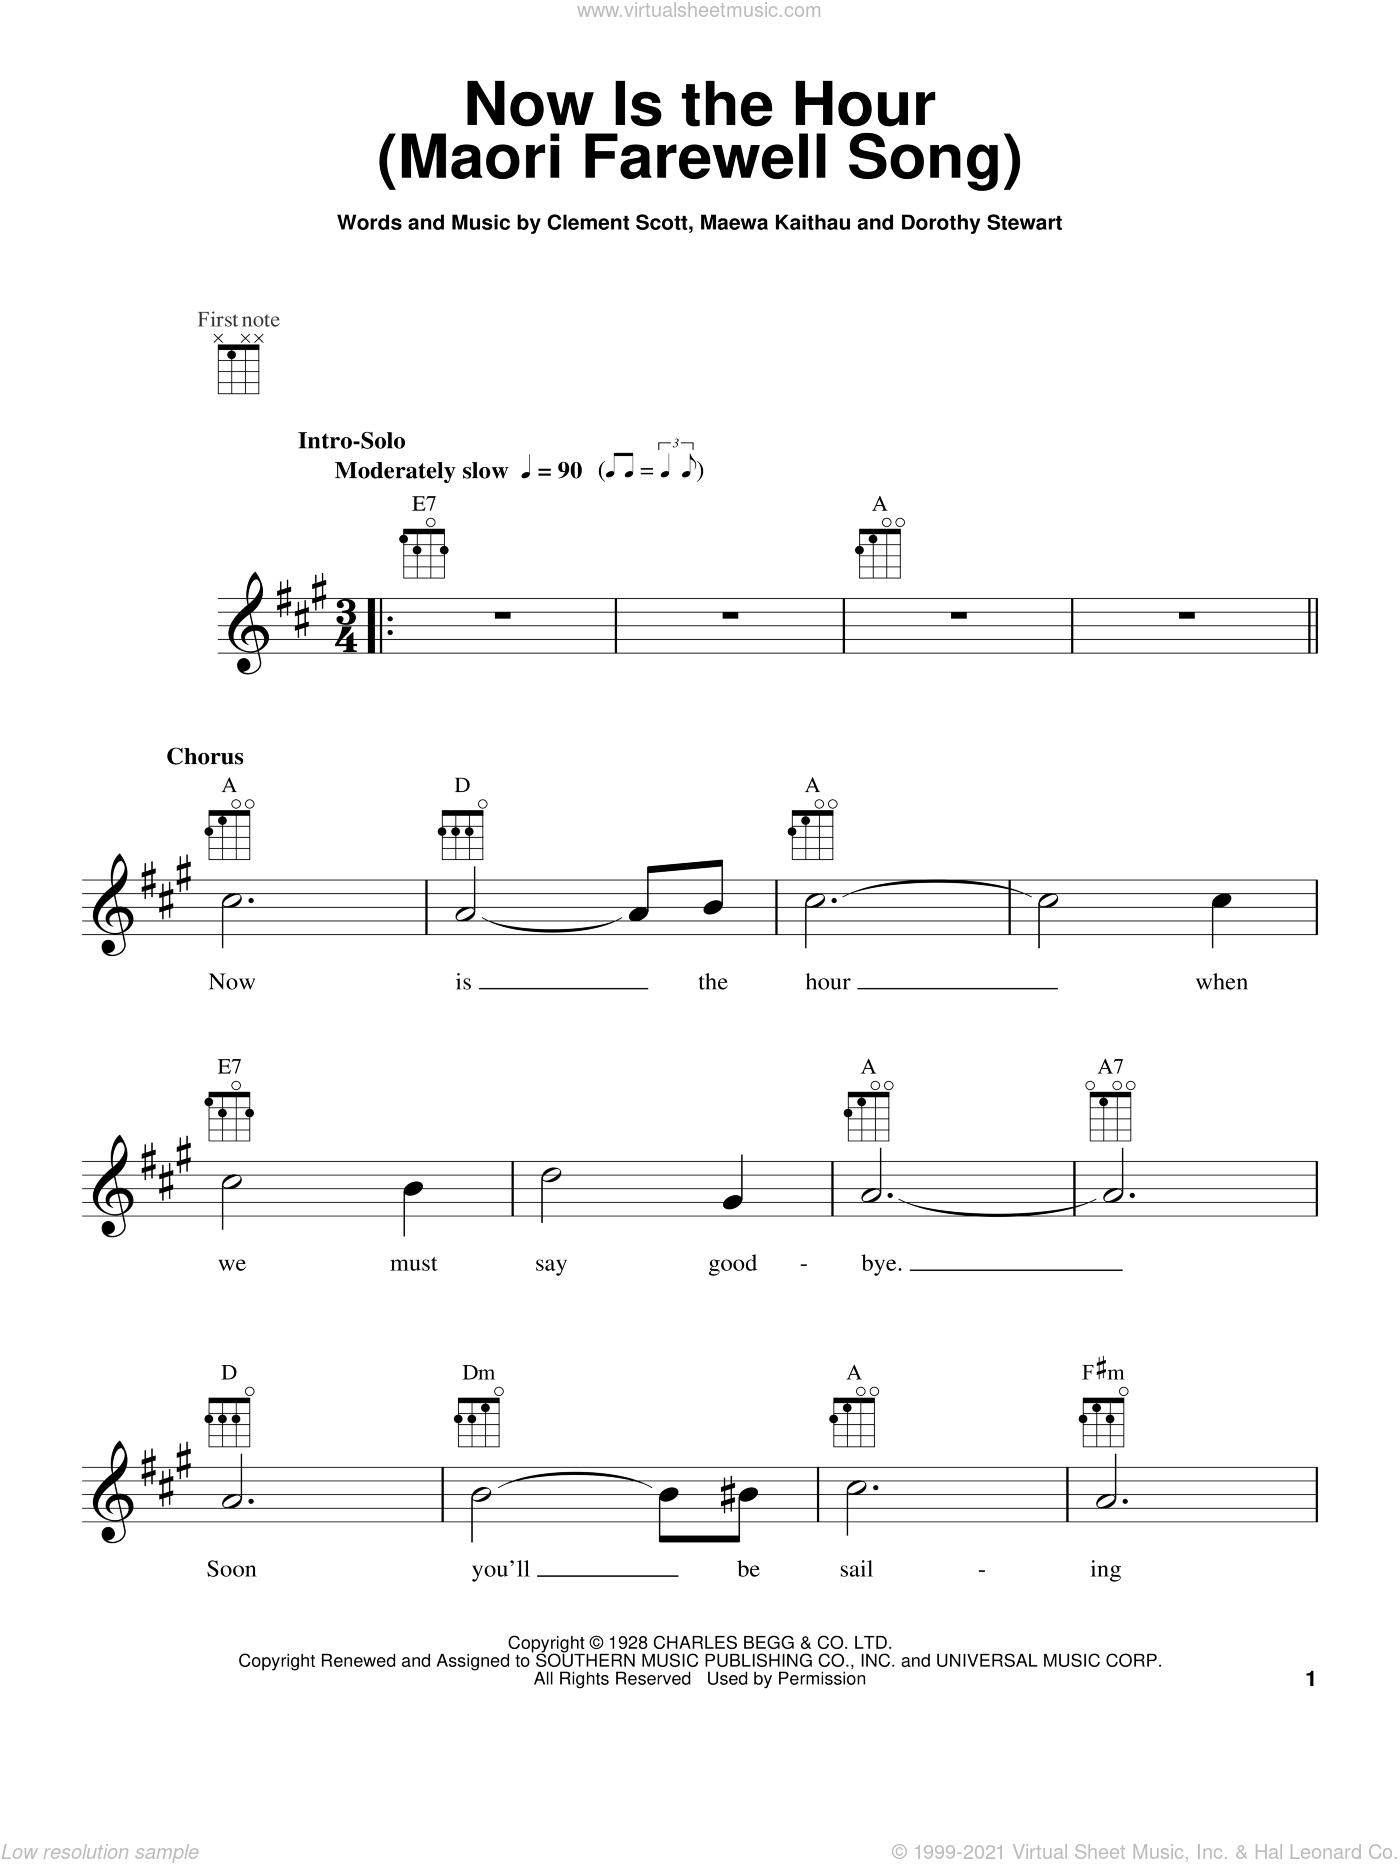 Now Is The Hour (Maori Farewell Song) sheet music for ukulele by Bing Crosby, Clement Scott, Dorothy Stewart and Maewa Kaithau, intermediate skill level